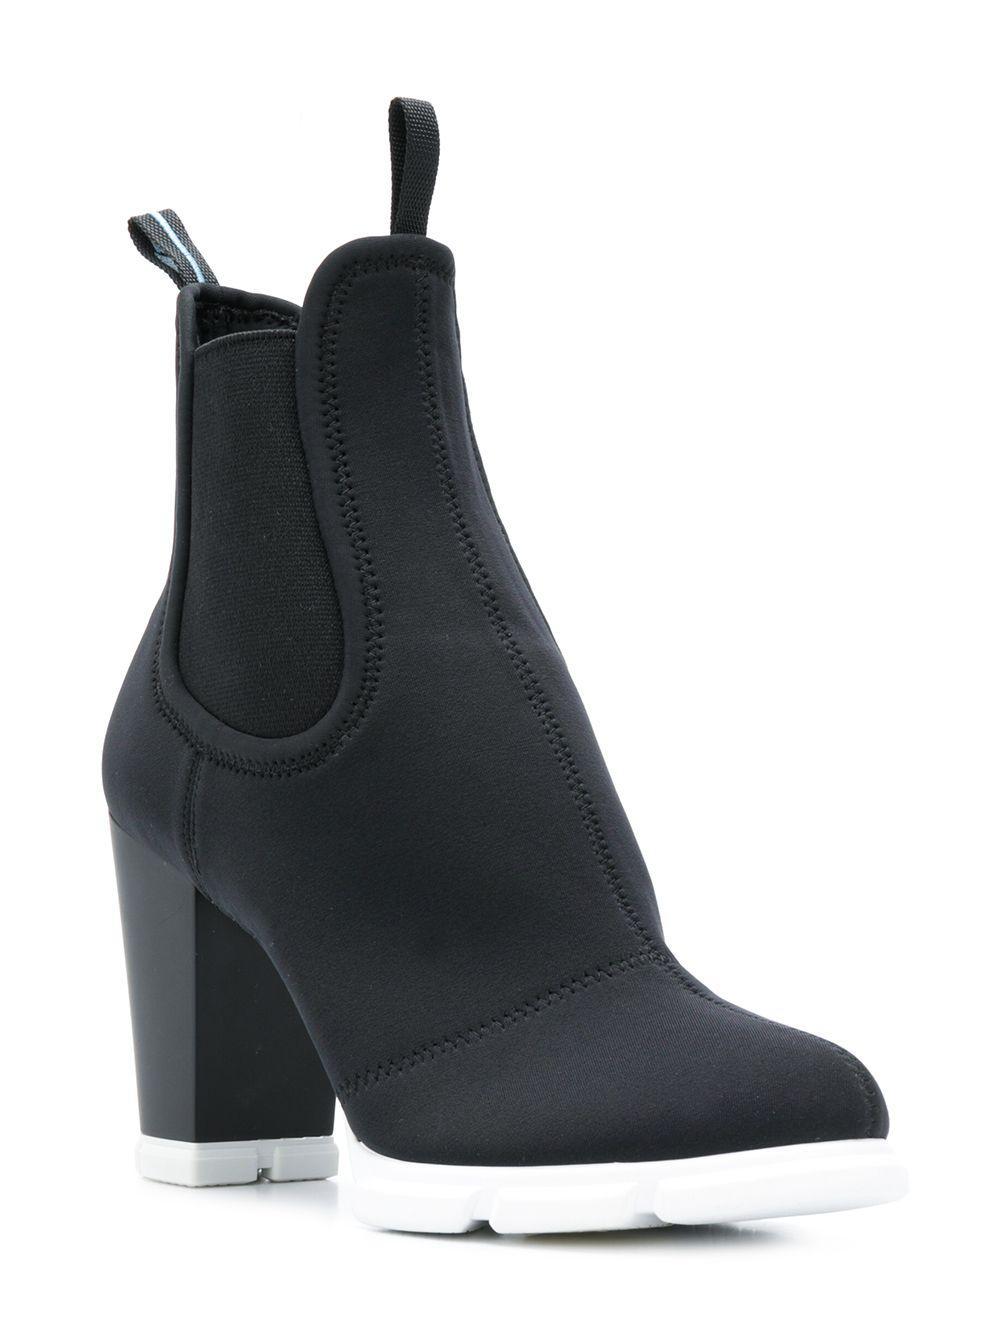 8f1addeb8e59 Lyst - Prada Scuba Ankle Boots in Black